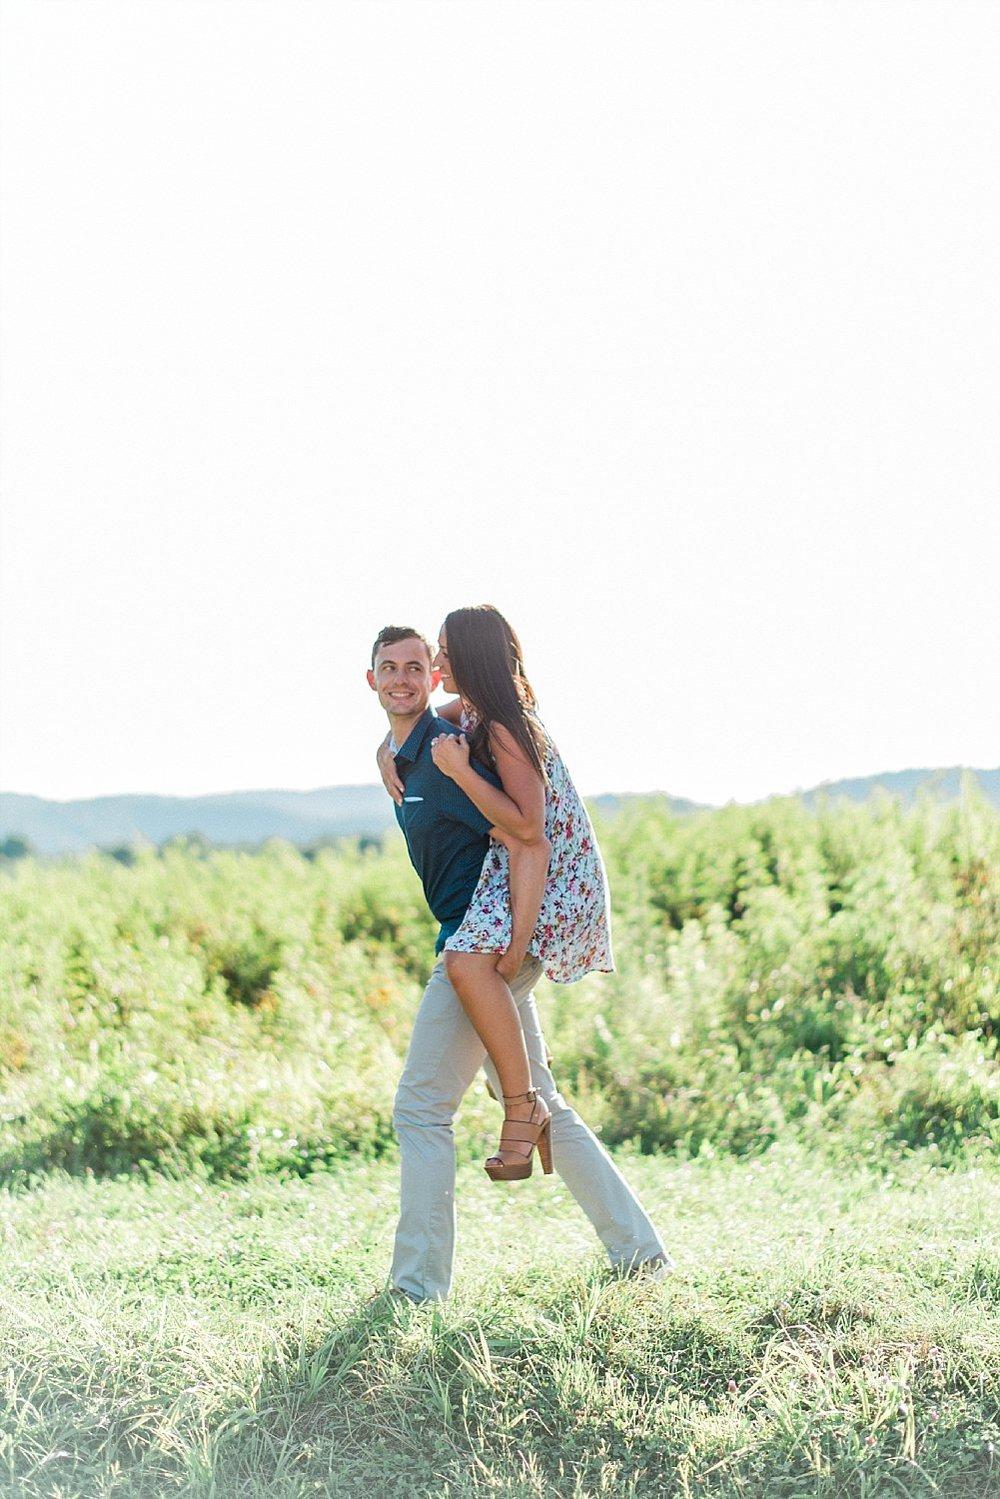 JuicebeatsPhotography_fineartengagement_Alisha&Evan_0013.jpg